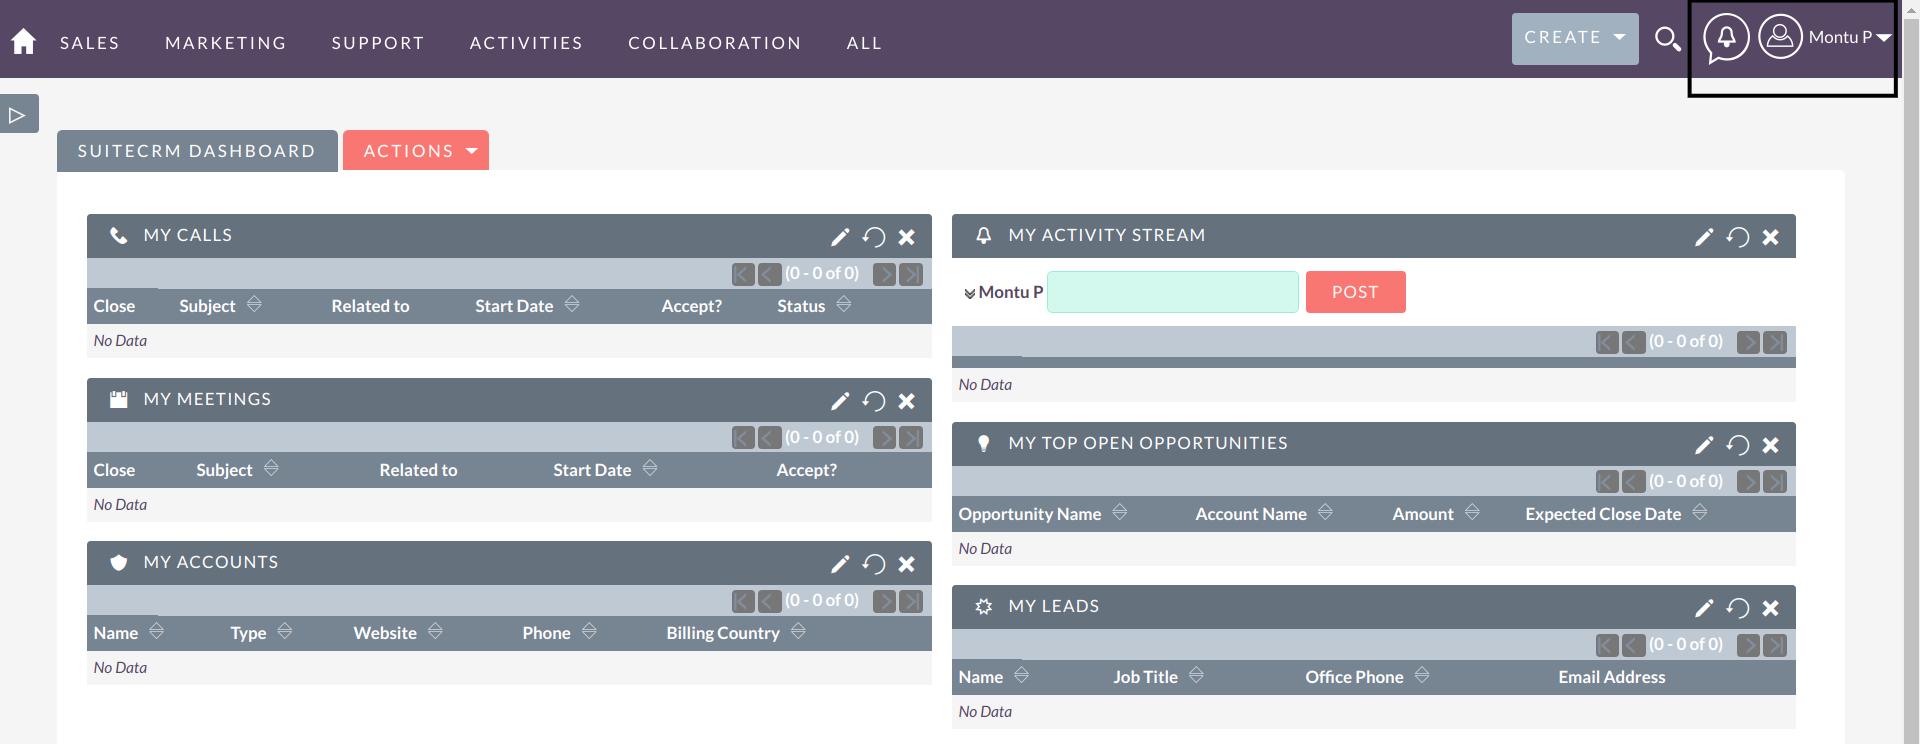 Sudo Login for SuiteCRM enter workspace of user